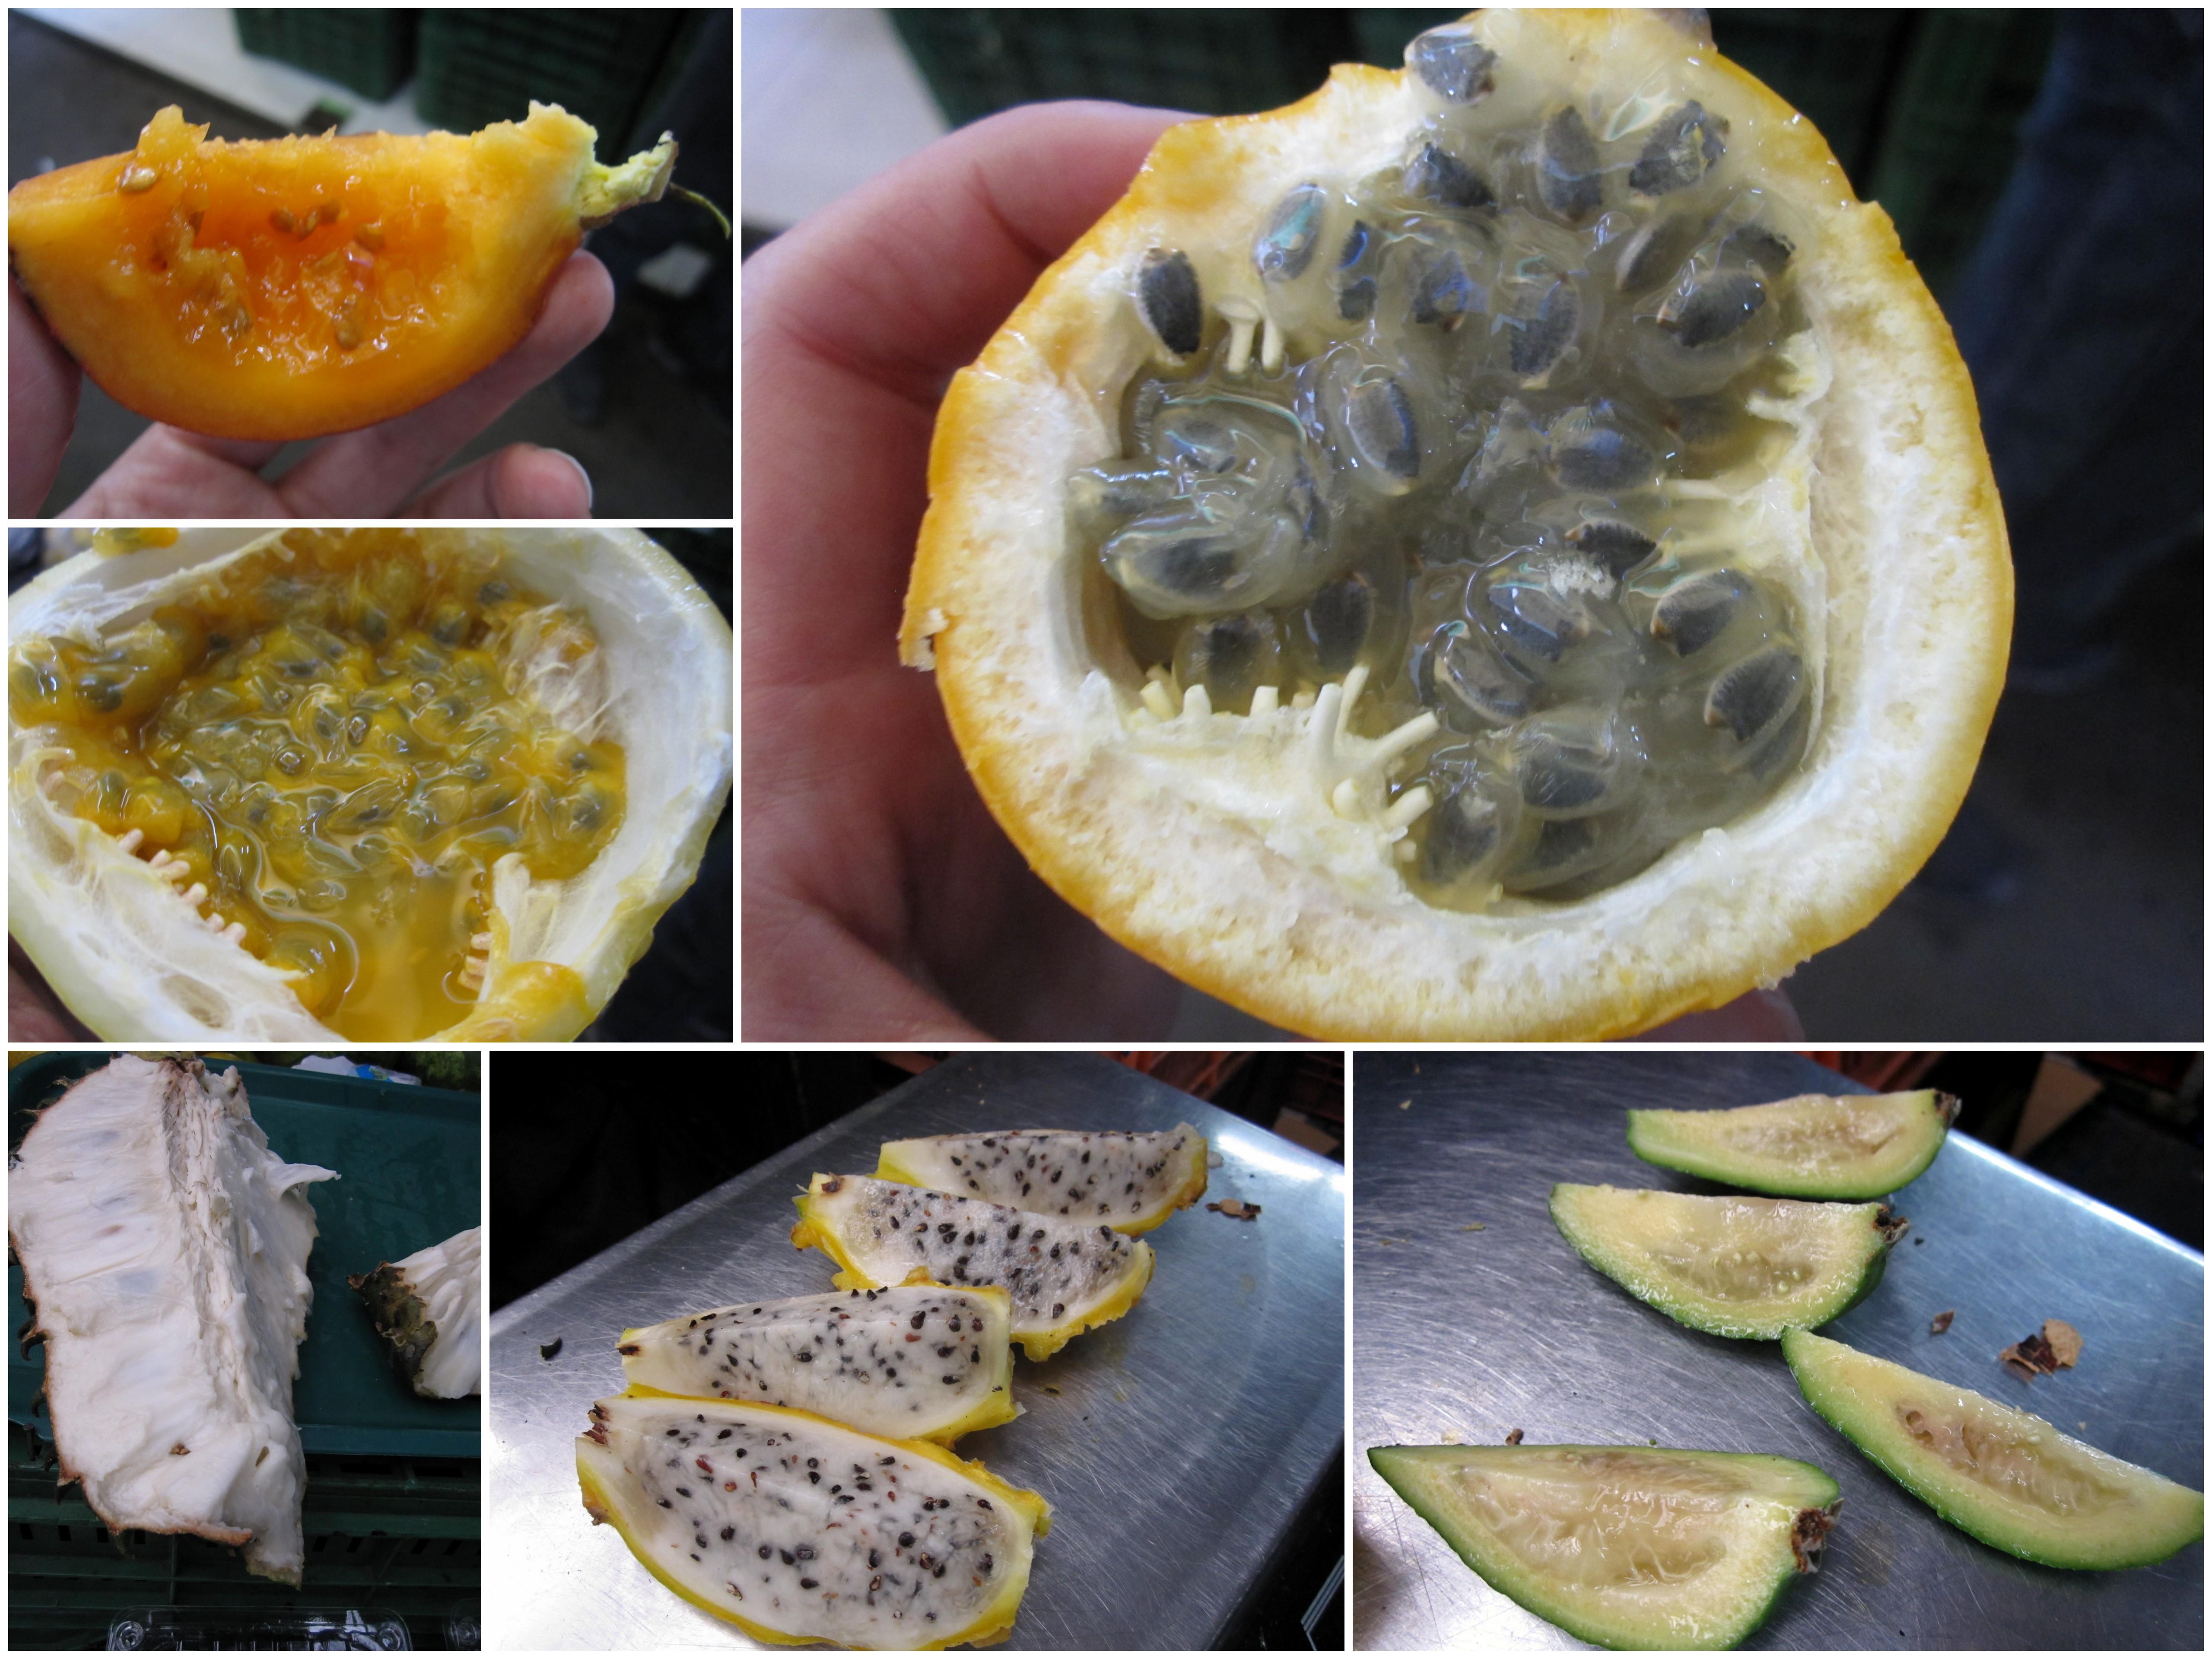 Fruit tasting in Bogota during the bike tour